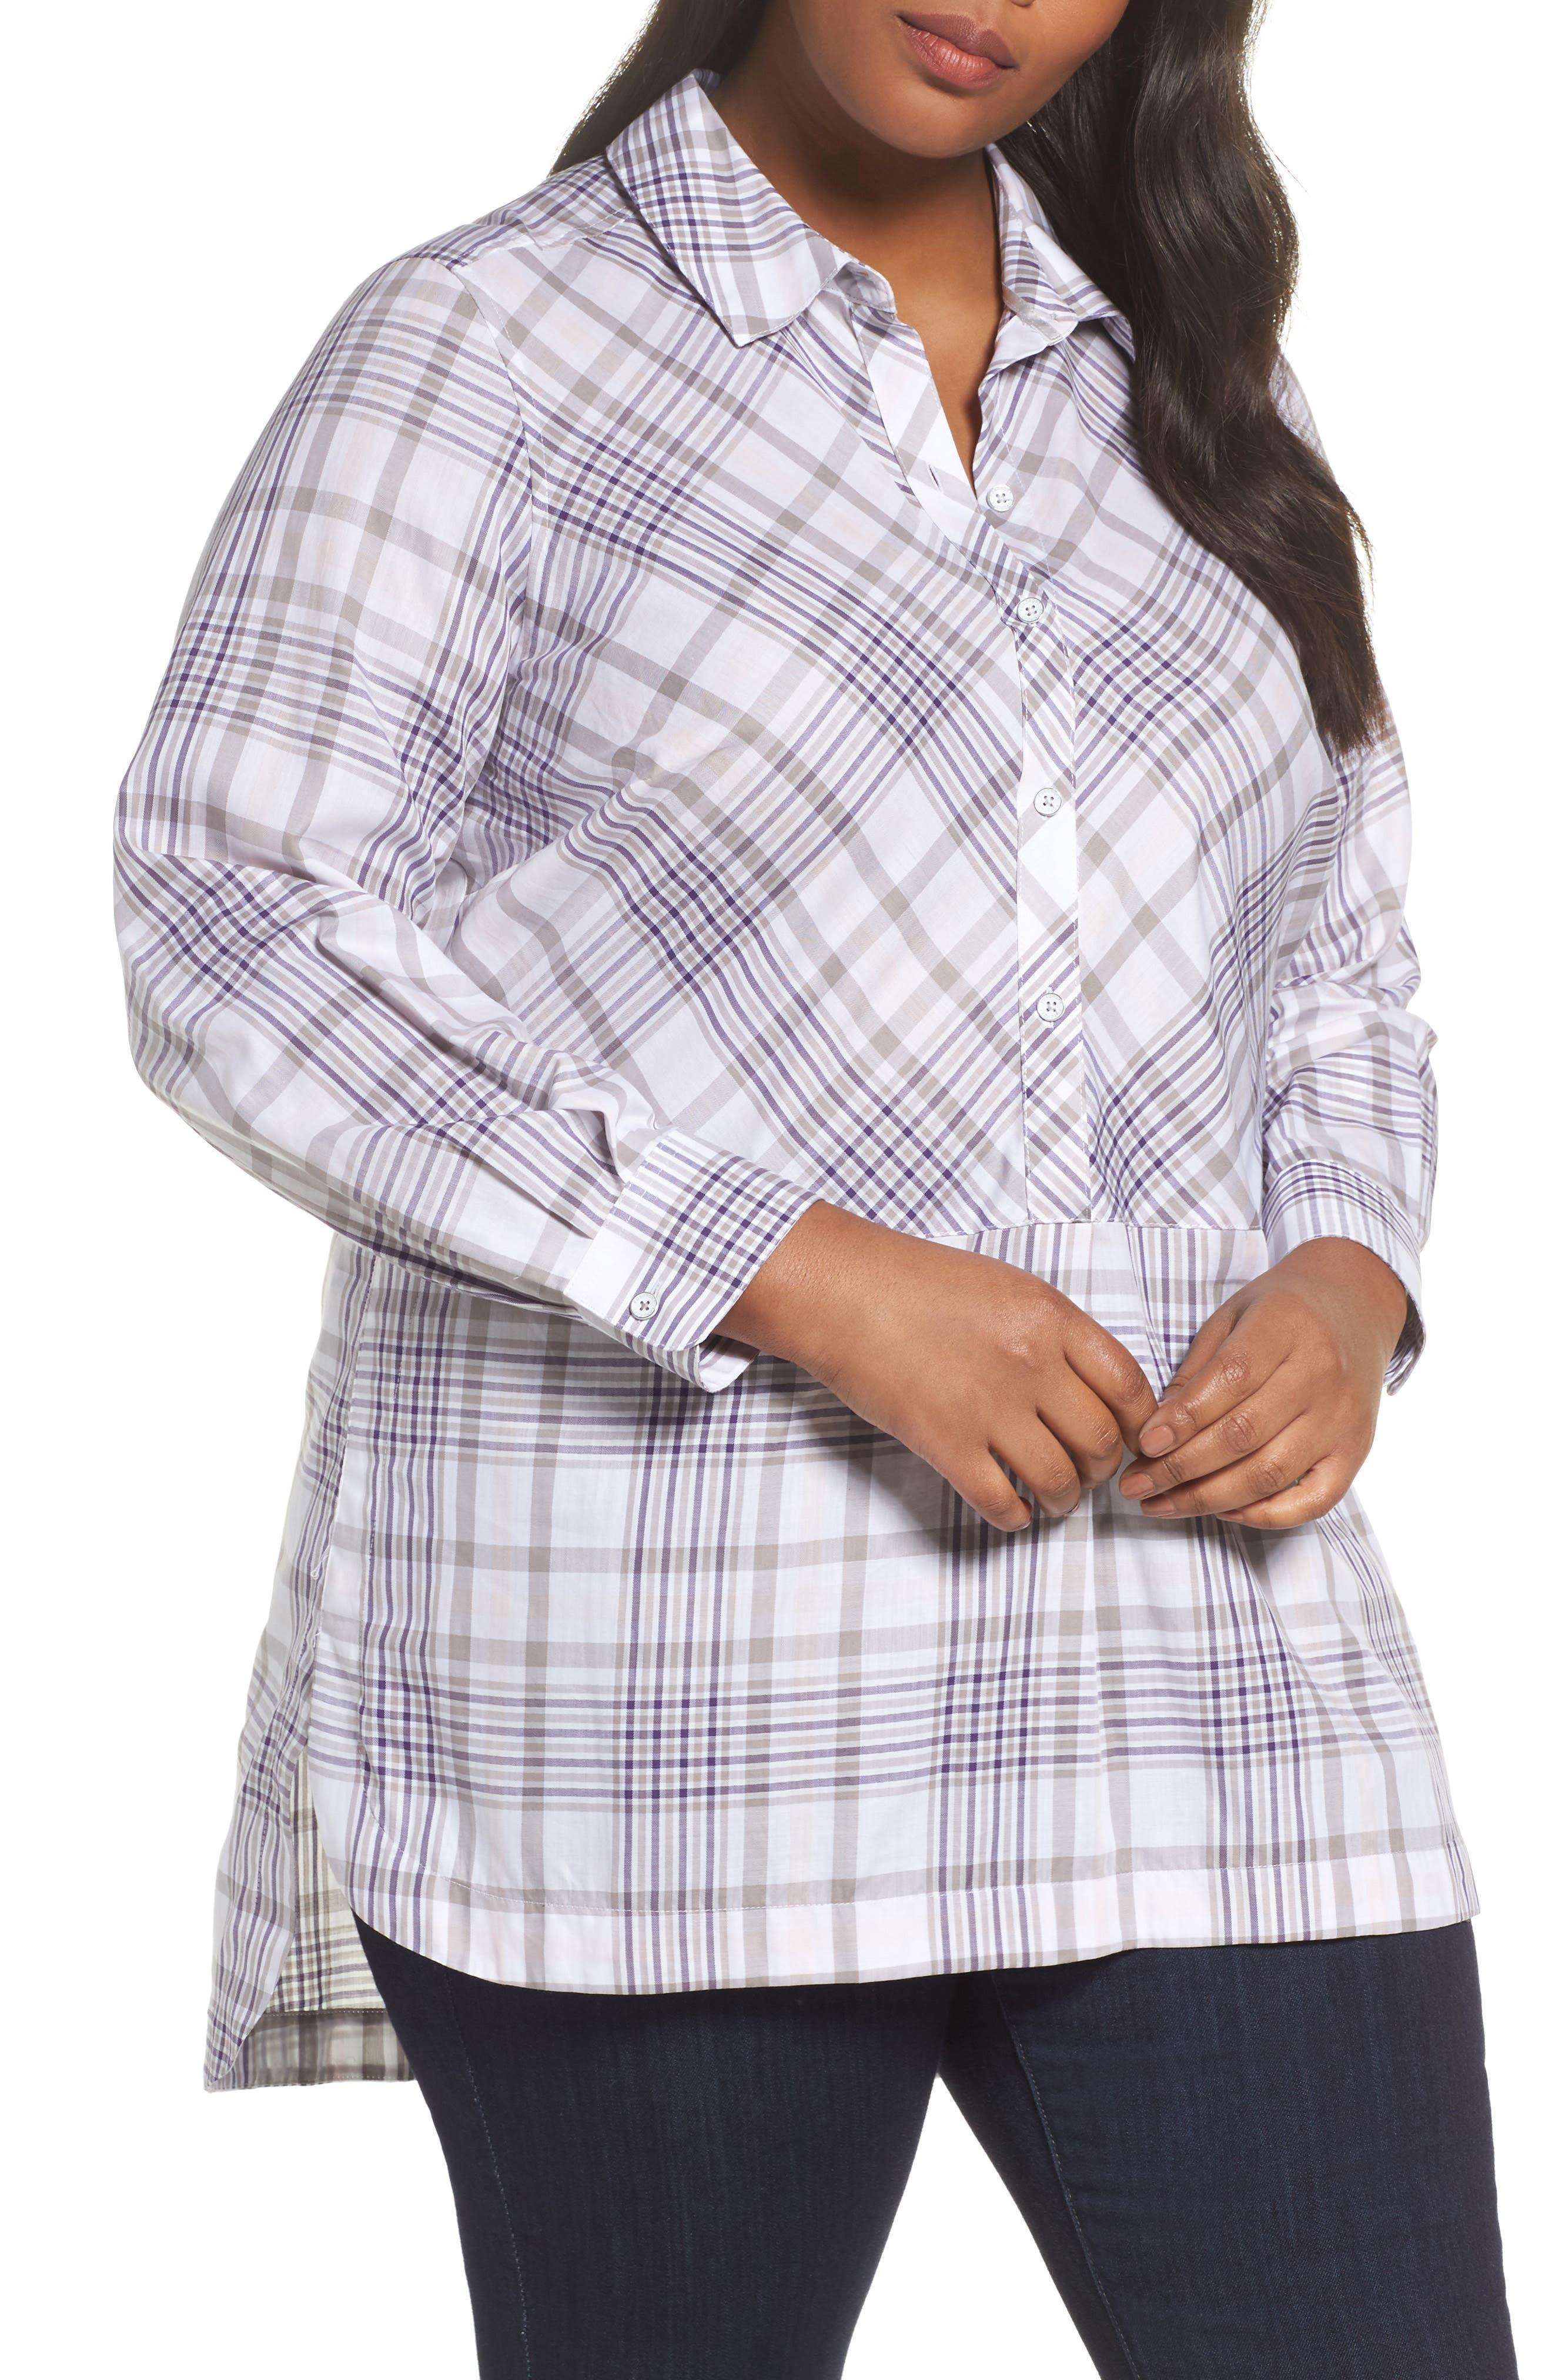 Maddy Winter Plaid Shirt,                         Main,                         color, 037